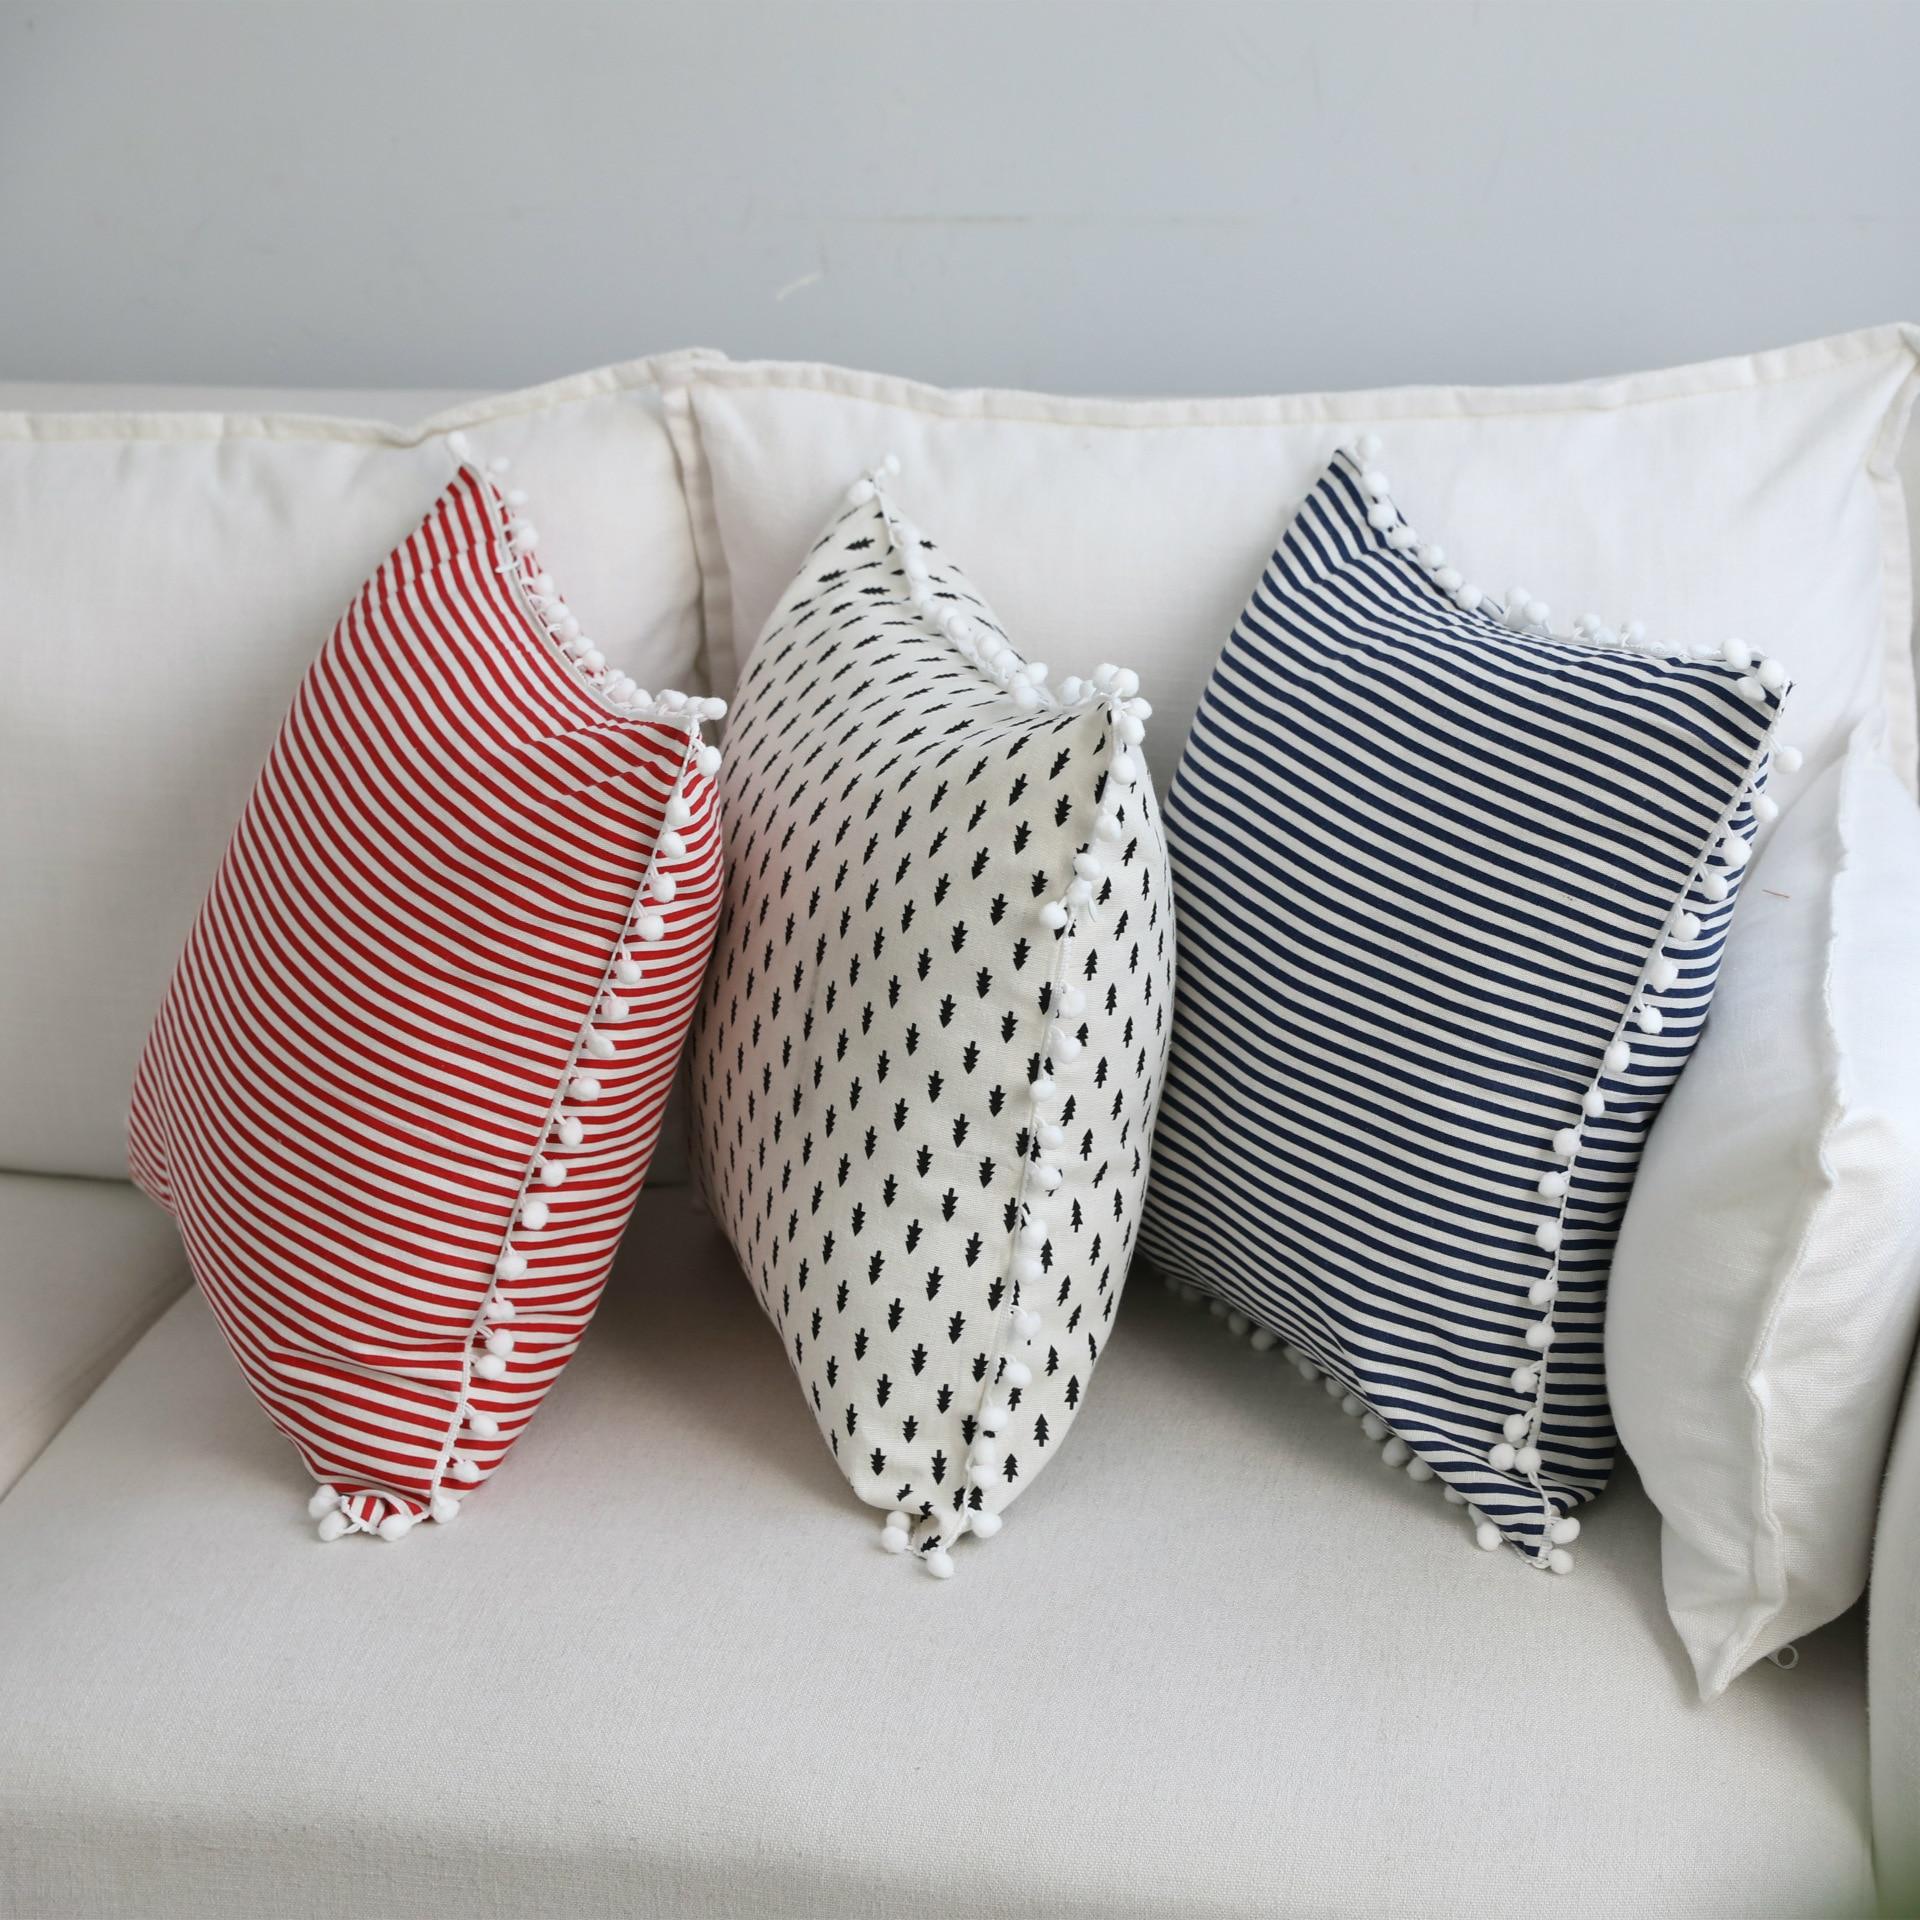 Home Simple Decorative Pillowcases Sweet Style Pom Tassel Dot Pillow Cases Cotton Linen Cover Home Party Hotel Textile 45cm*45cm